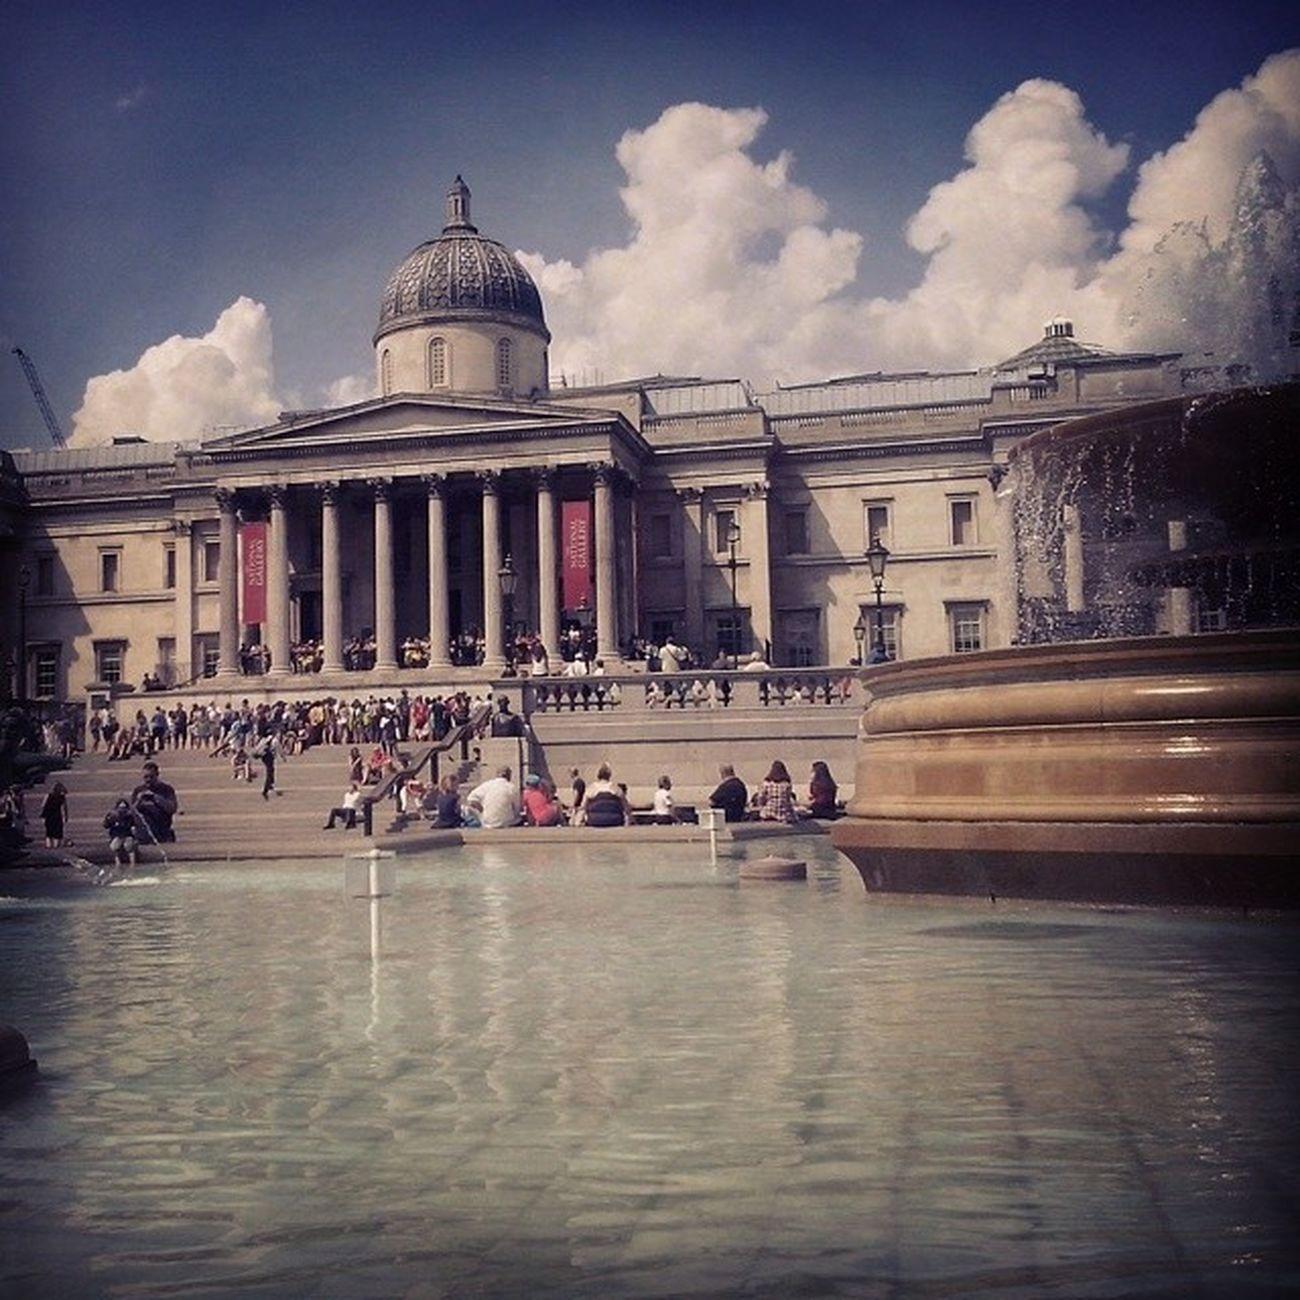 British Museum London Asdfggkdkd